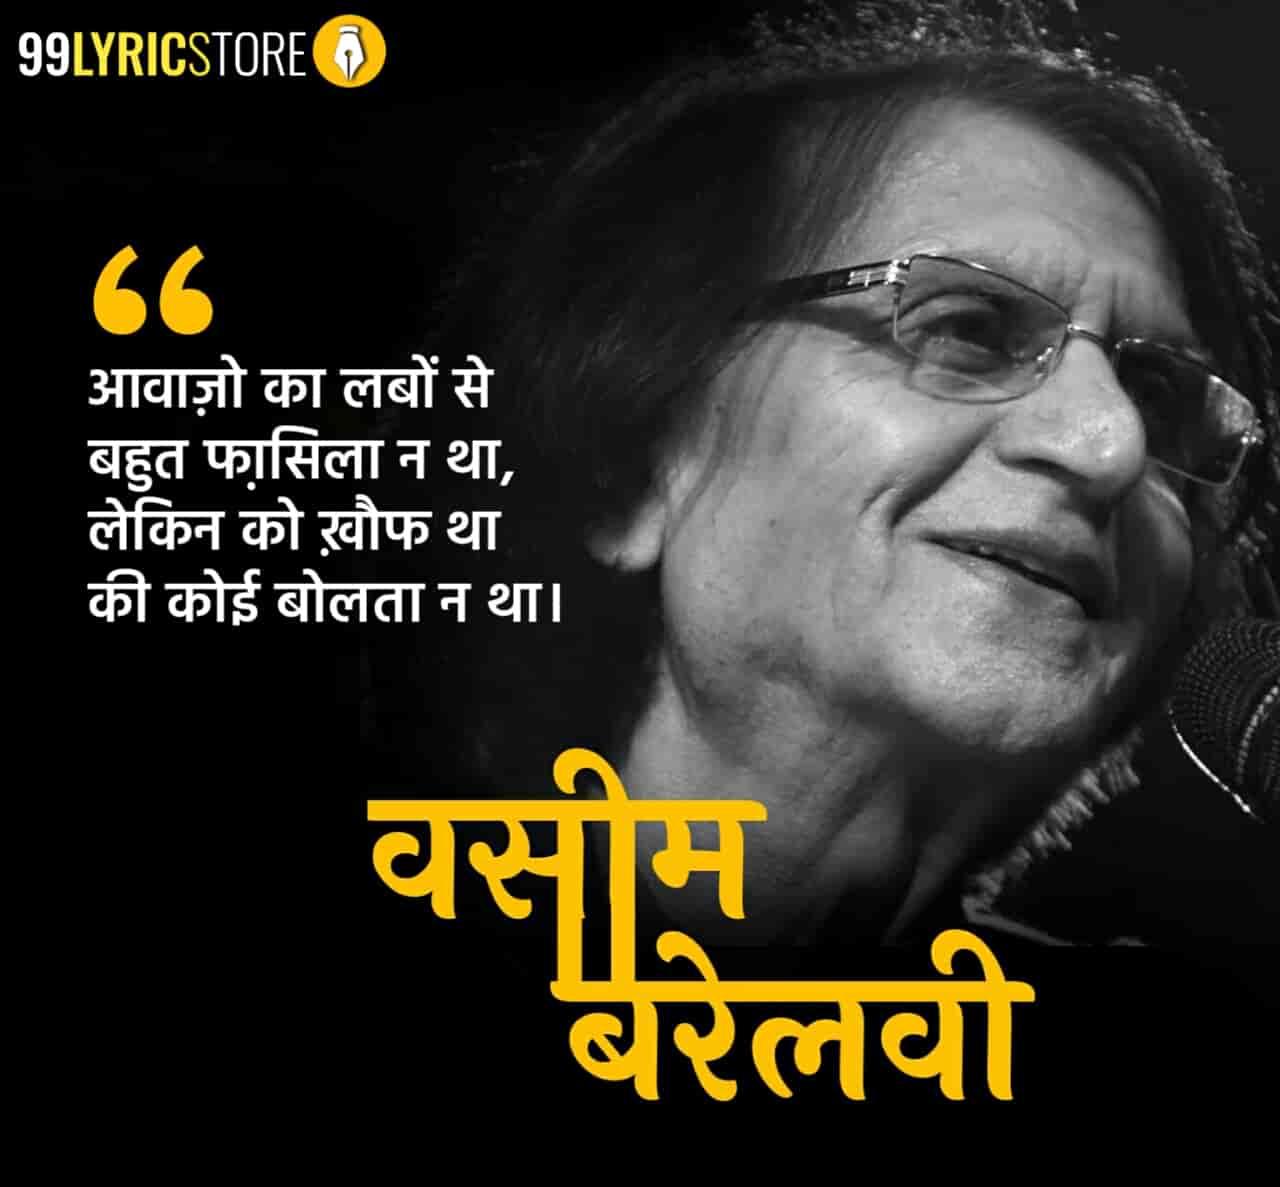 This beautiful ghazal 'Aawaazo Ka Labon Se Bahut Faasila Na Tha' has written by Waseem Barelvi.